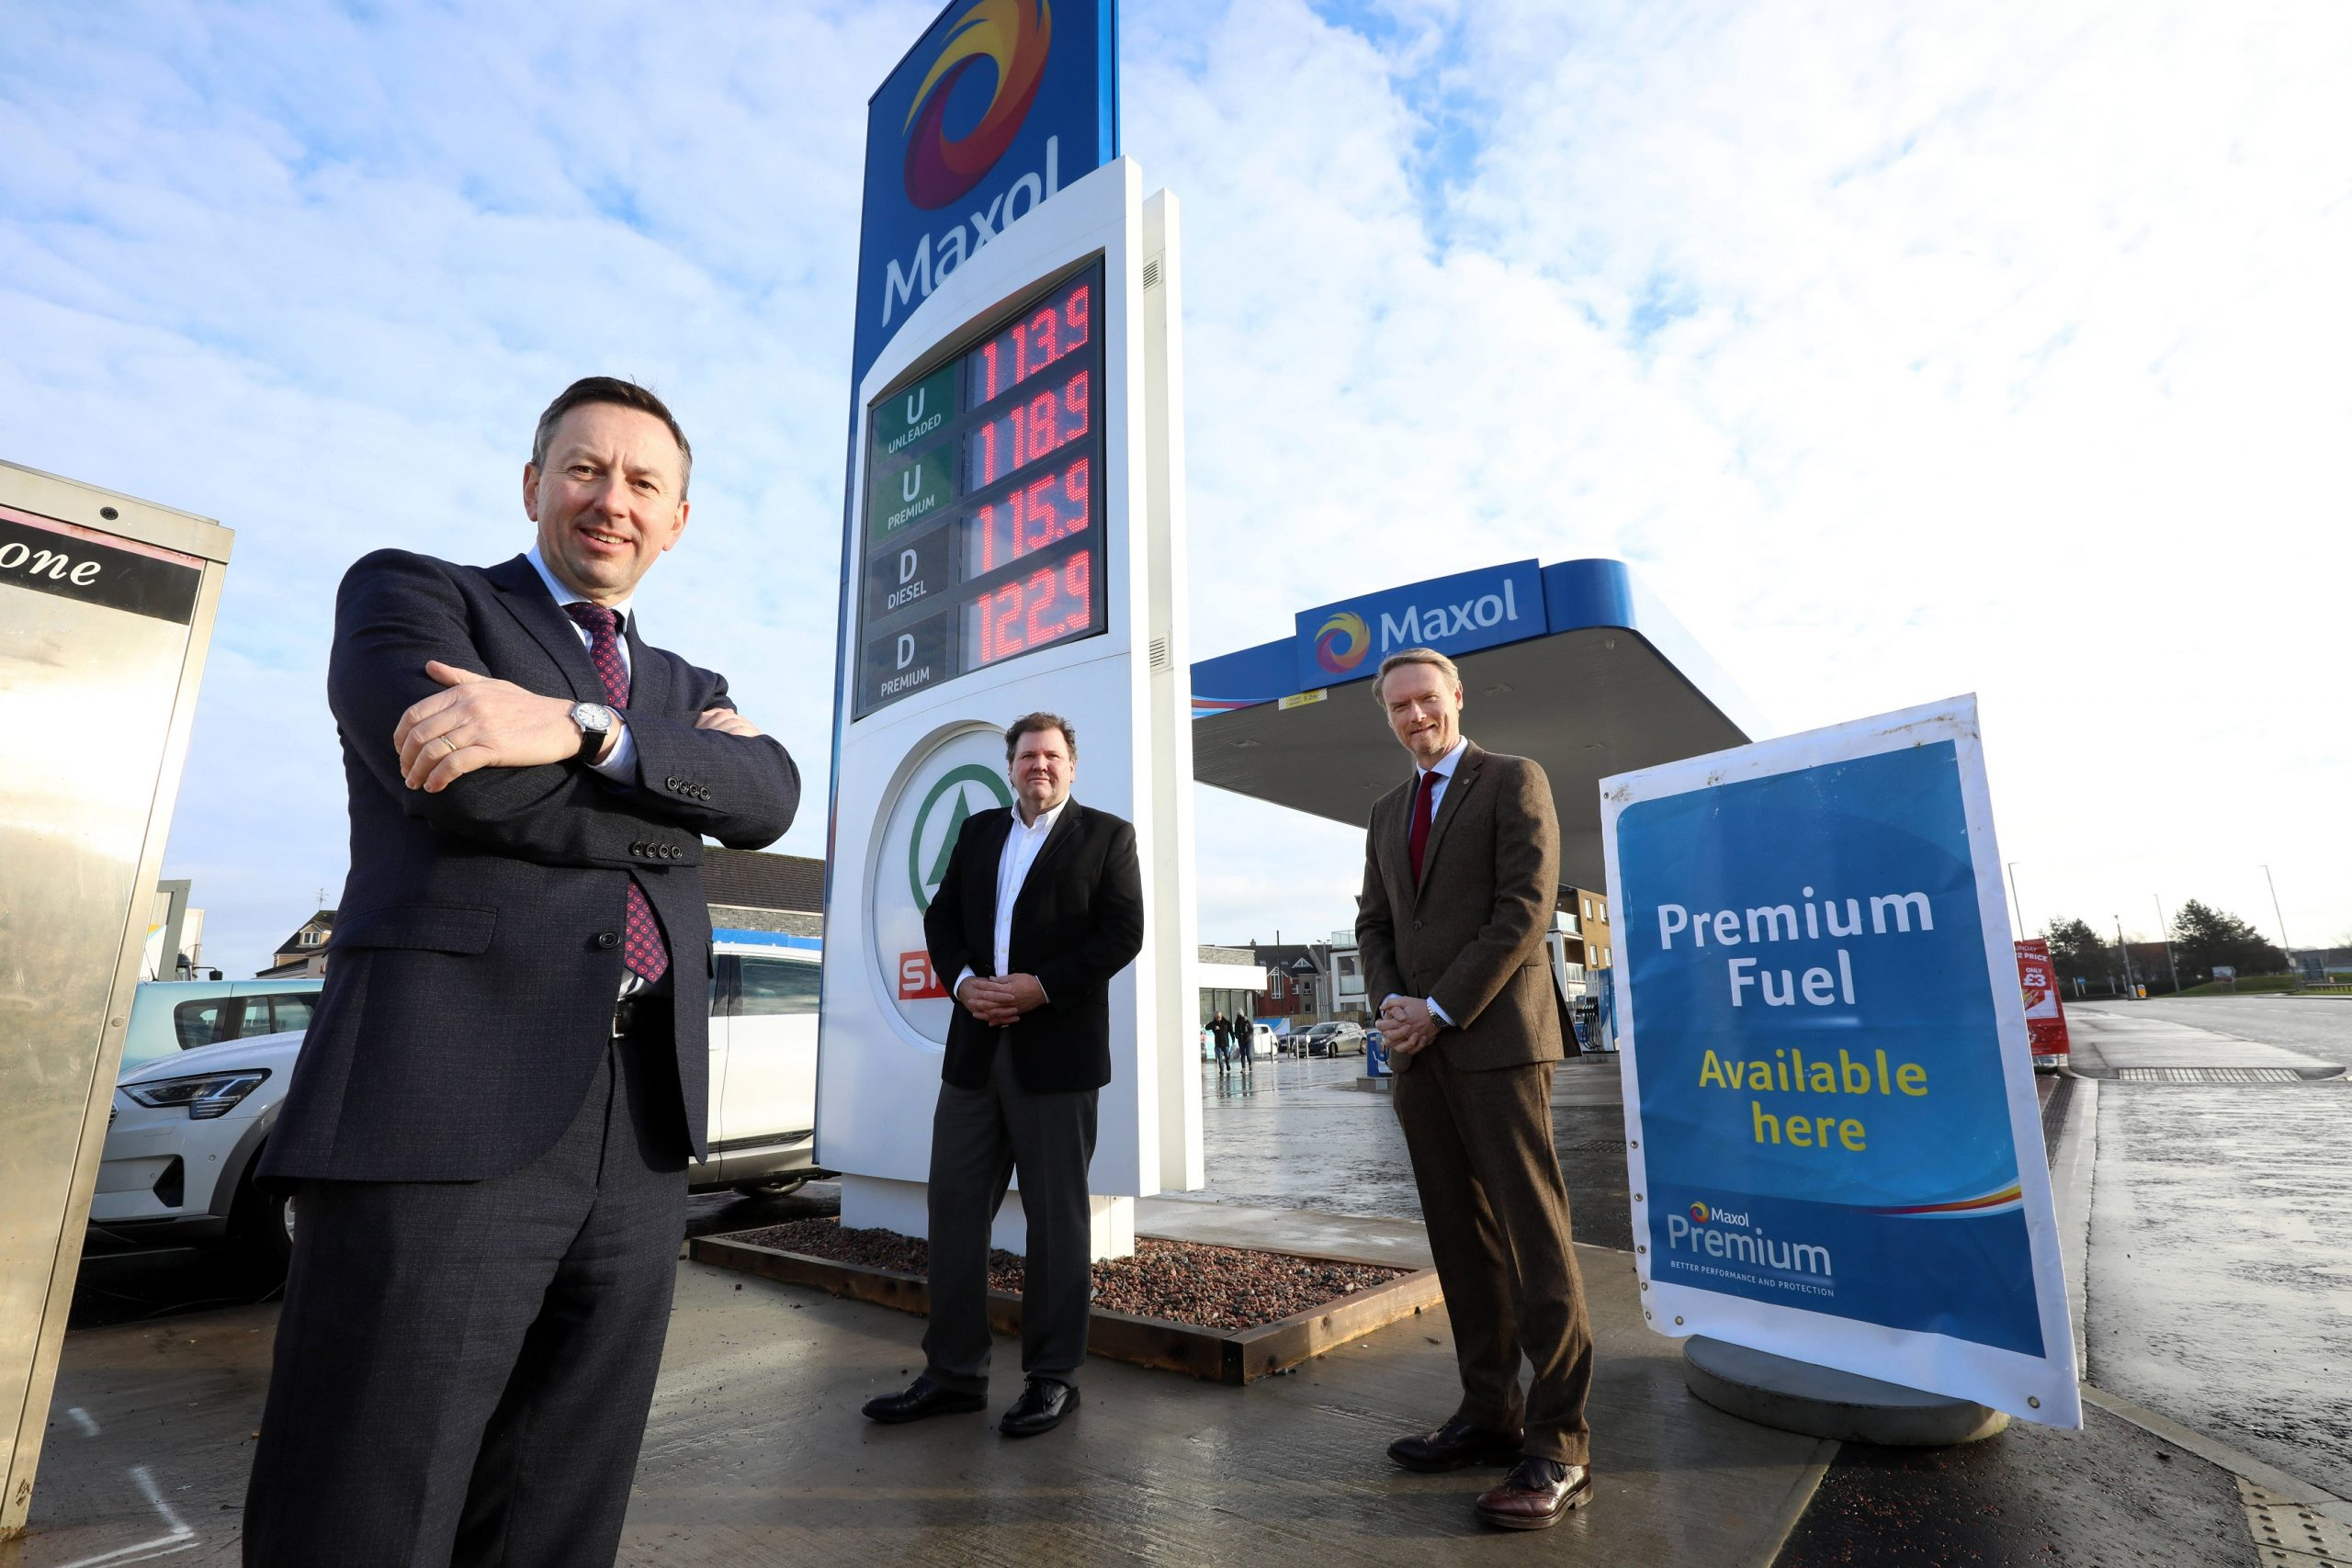 Maxol Celebrates £1.7m investment in Portrush Forecourt